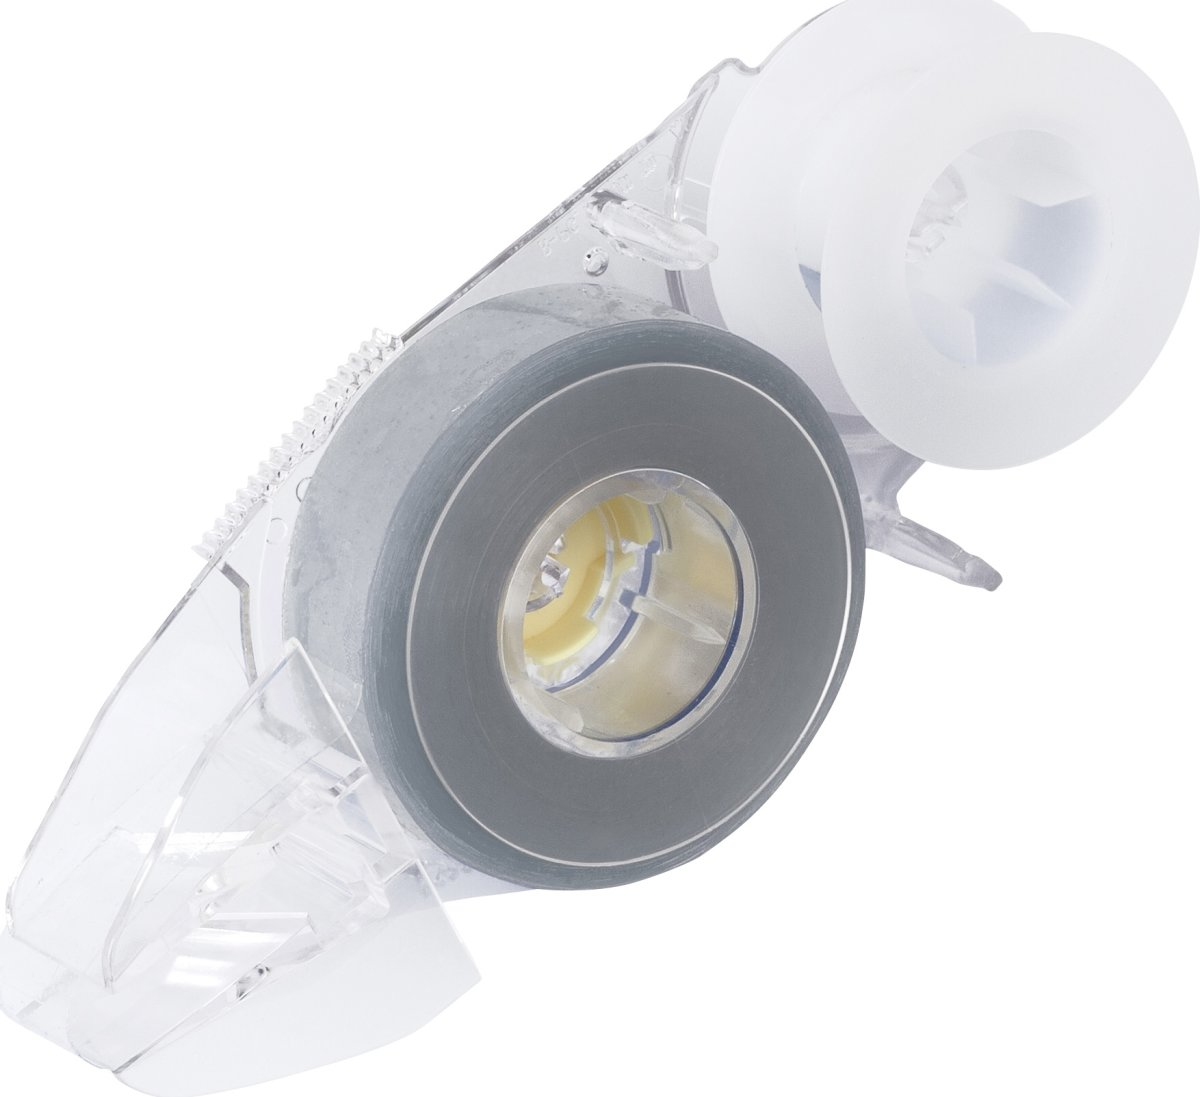 Tombow Maxi Power Limroller Refill